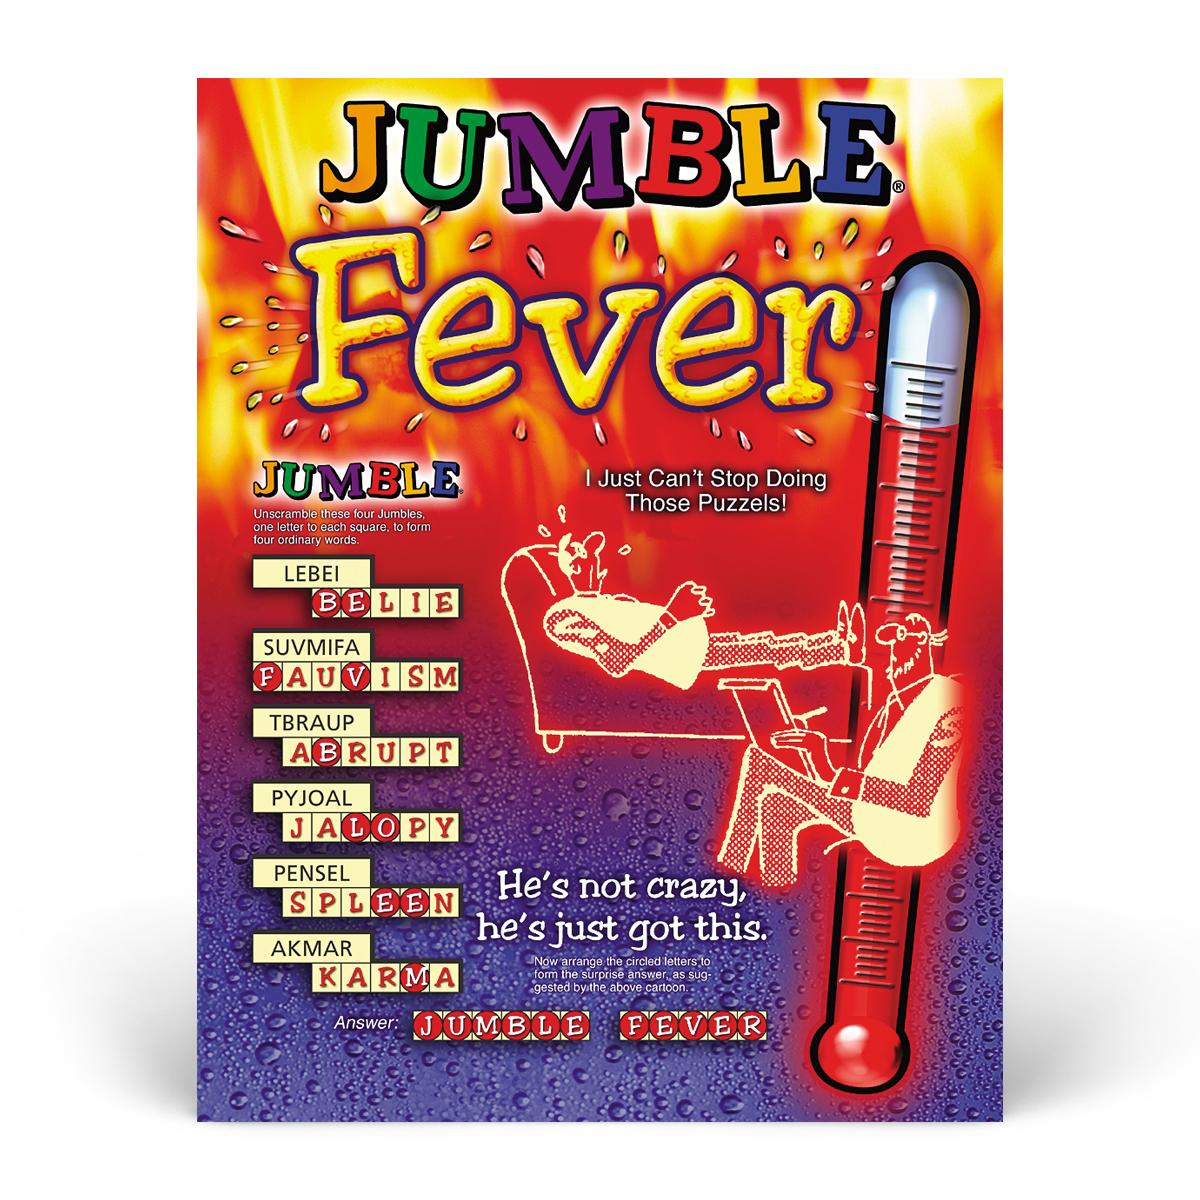 Jumble! Fever